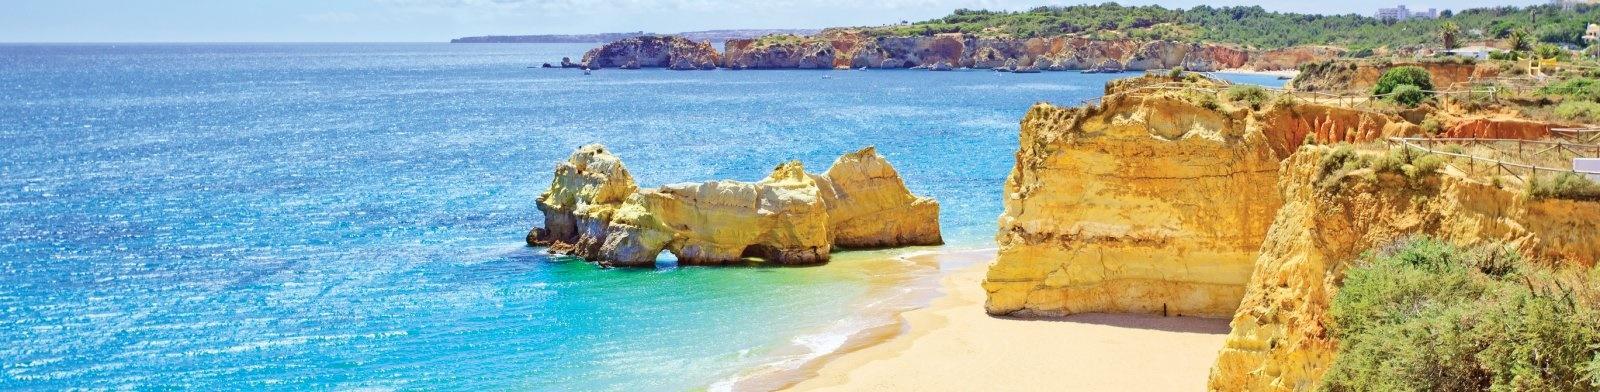 Algarve, main image